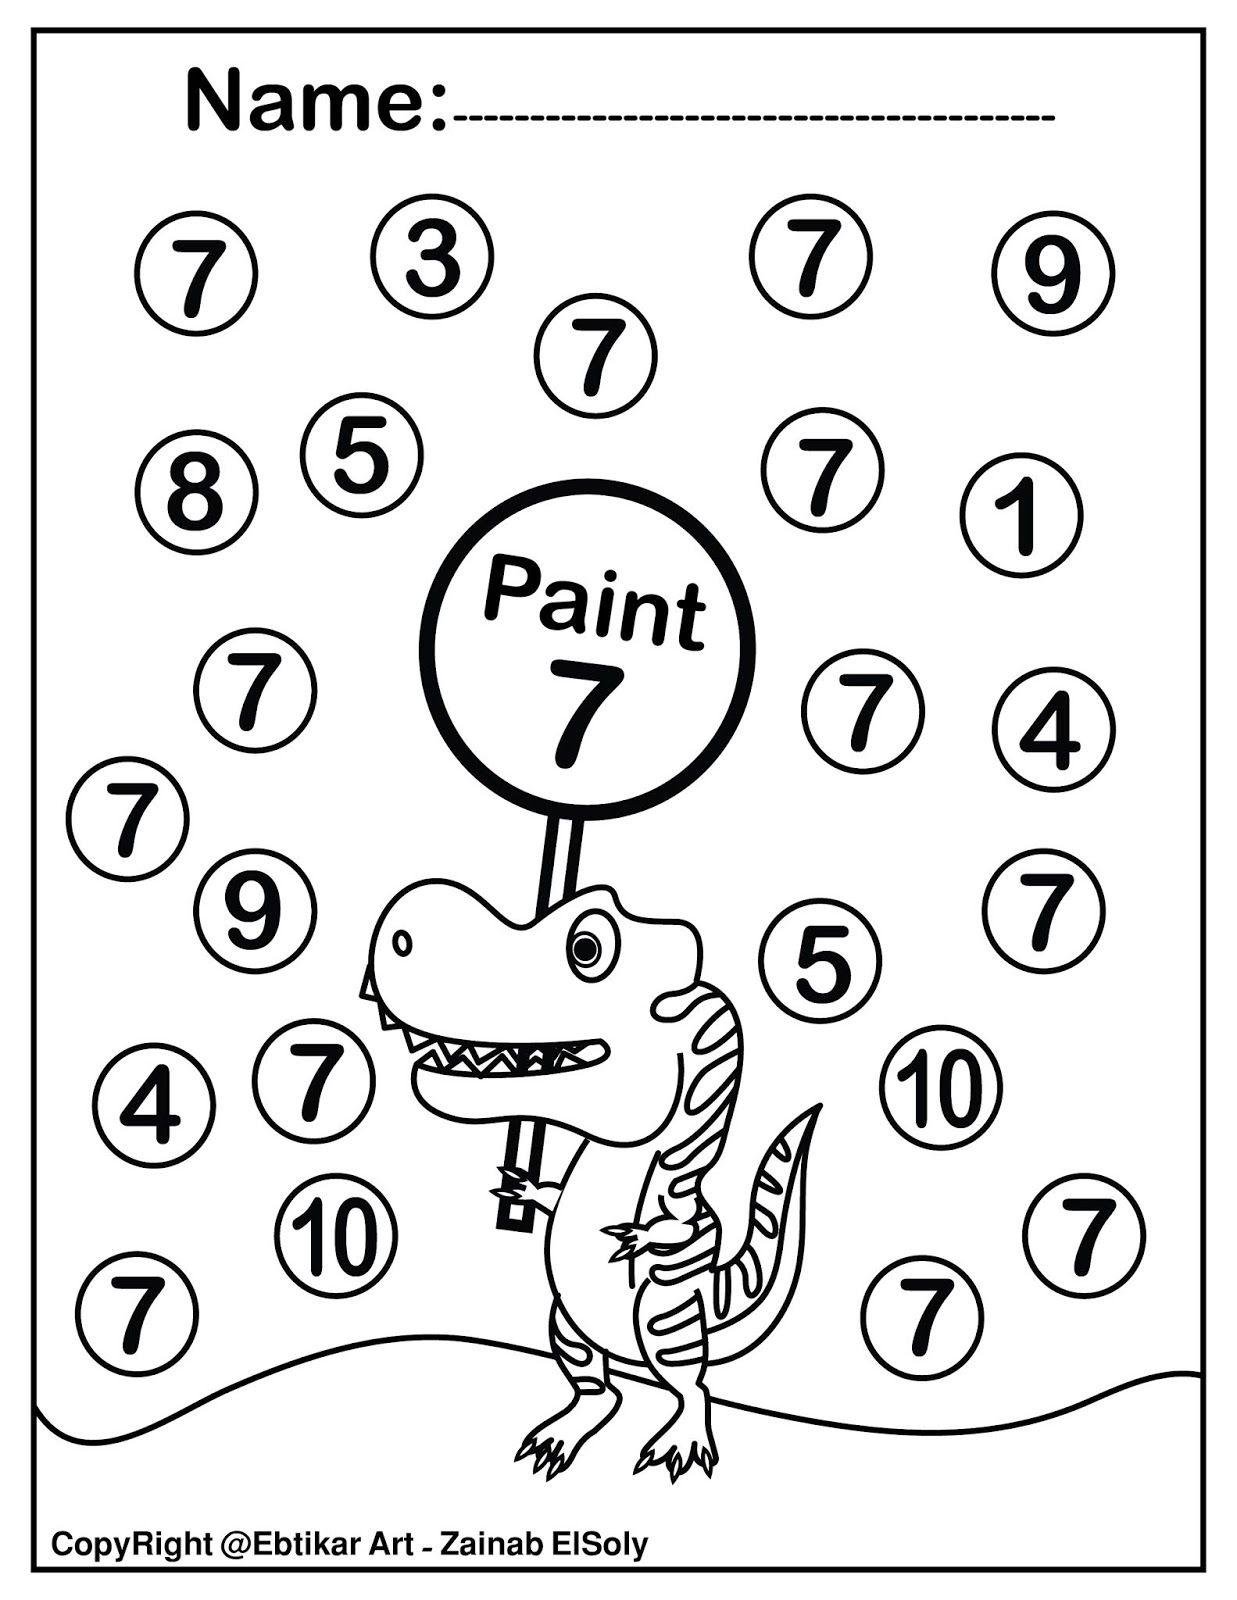 Set Of 123 Dinosaur Trex Activity Paint A Dot Preschool Coloring Sheets Kindergarten Coloring Pages Abc Worksheets Abc Coloring Pages [ 1600 x 1237 Pixel ]